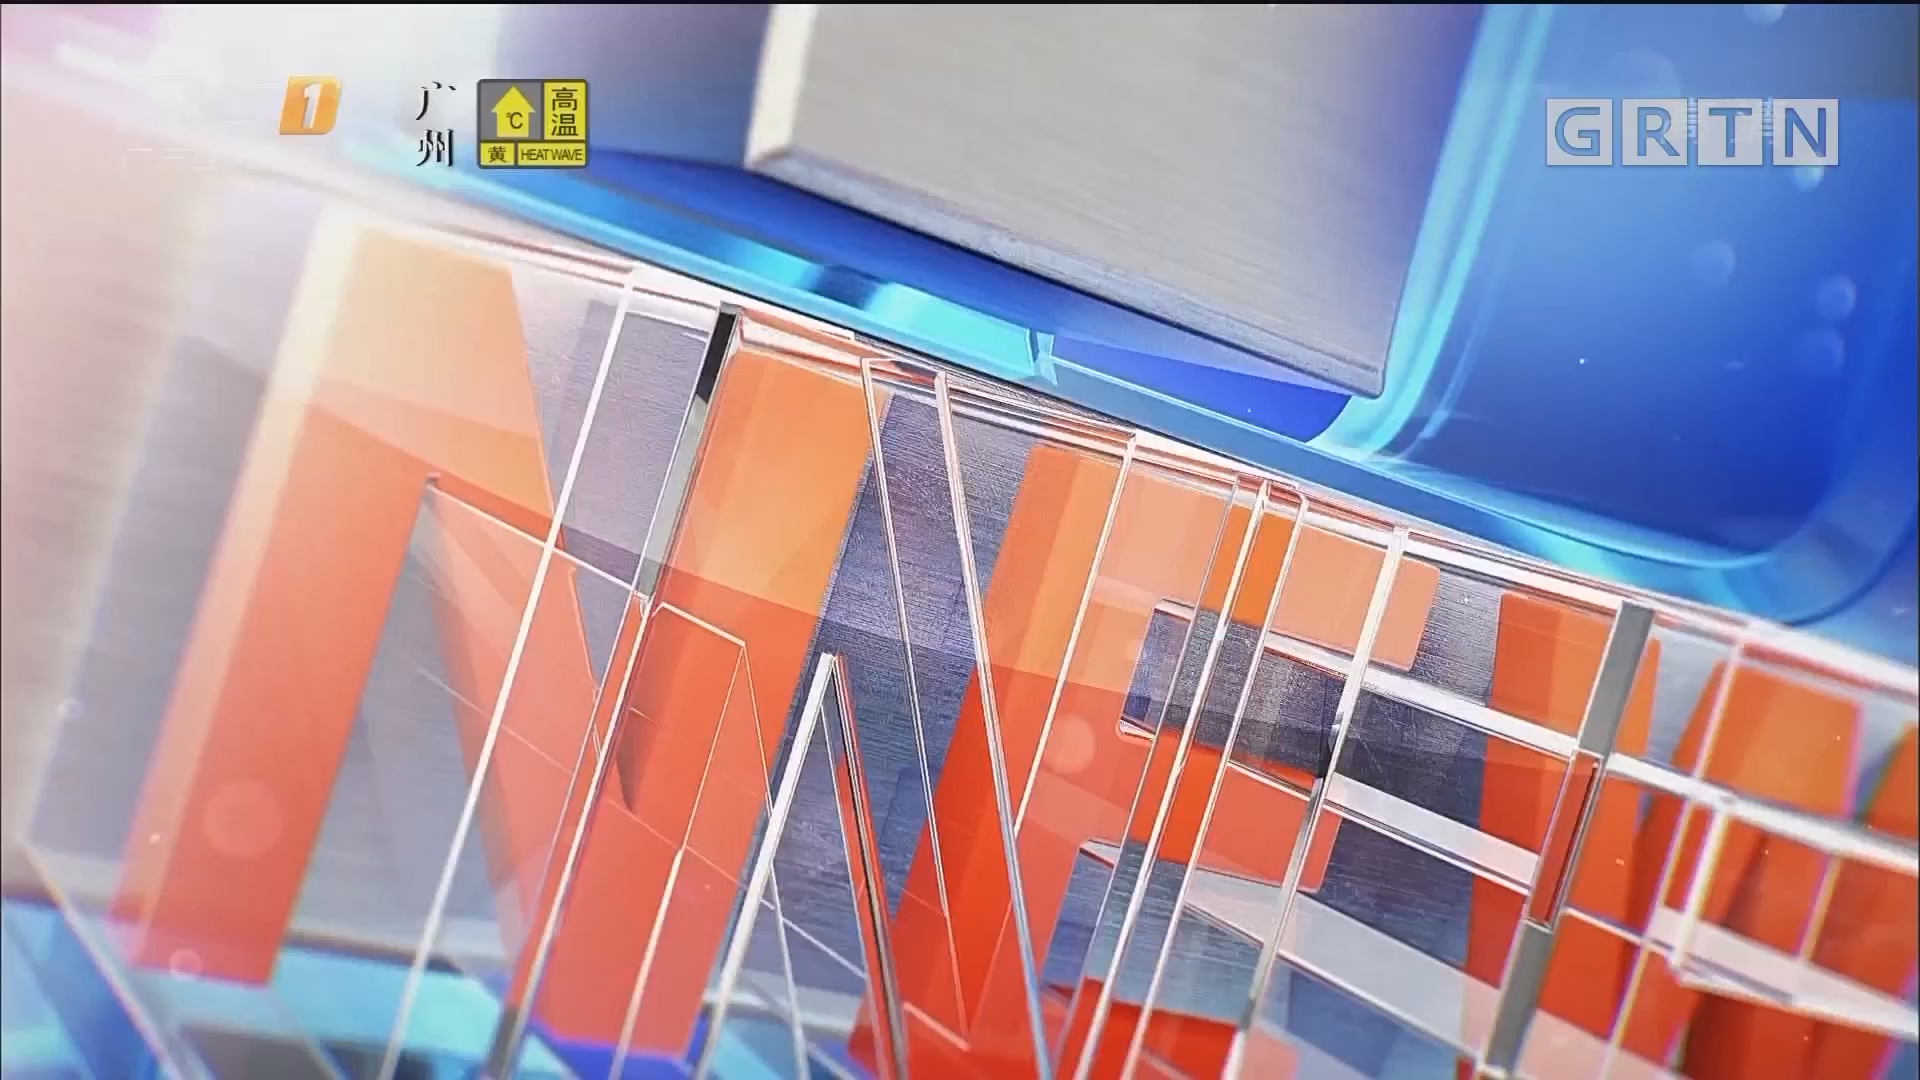 [HD][2019-09-12]南方财经报道:港交所+伦交所:估值316亿英榜 有望成全球第三大交易所